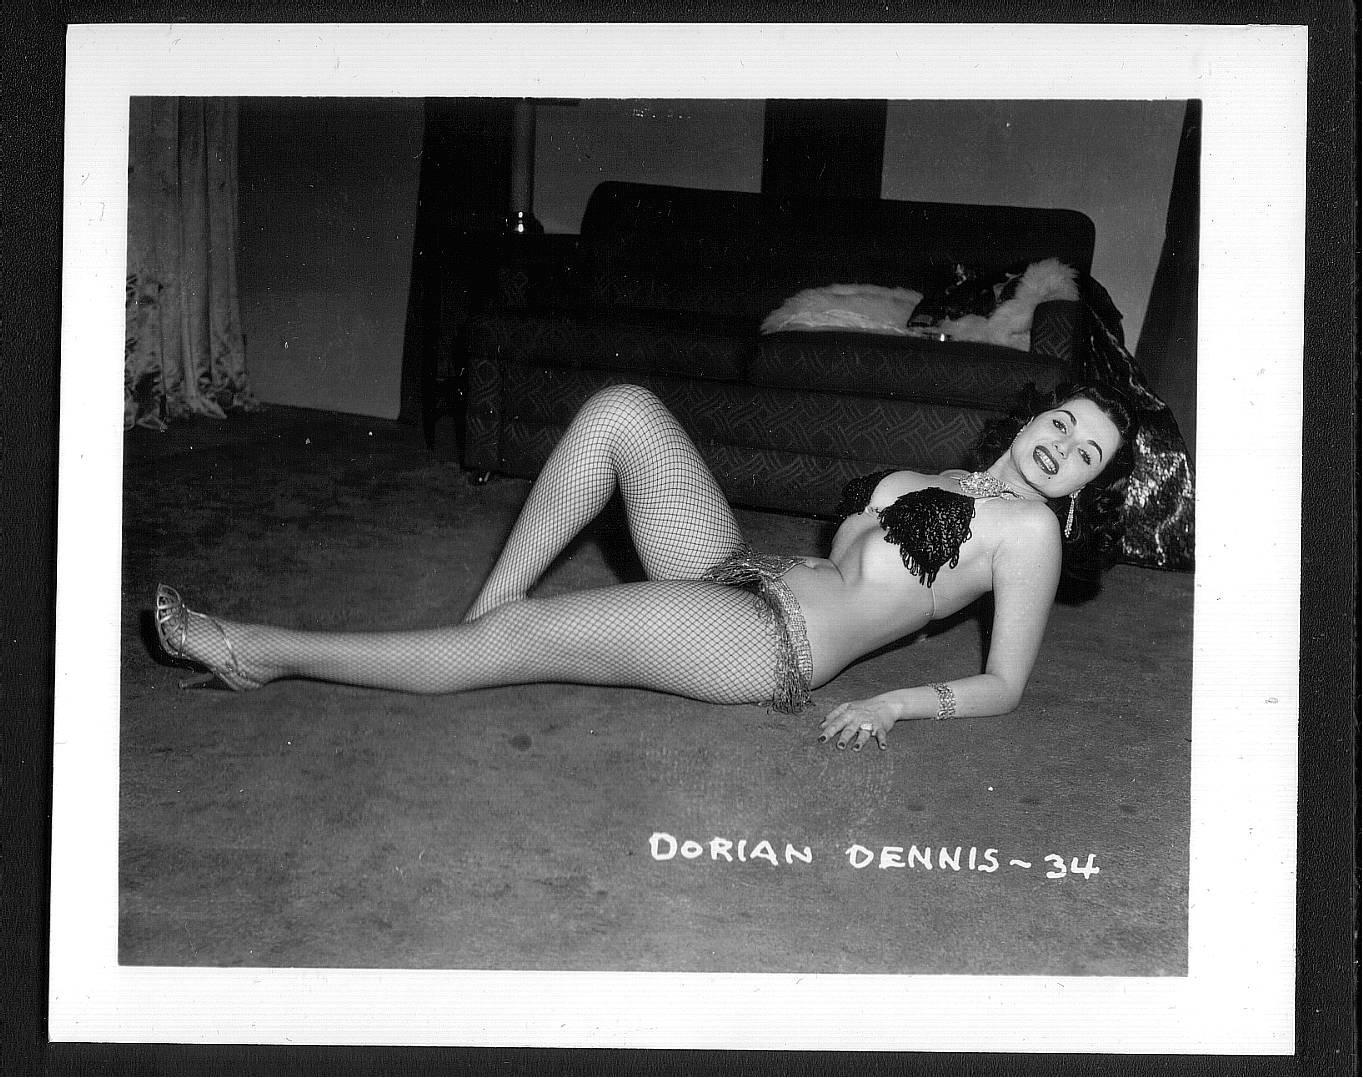 STRIPPER DORIAN DENNIS BUSTY BOSOMY POSE NEW REPRINT 5 X 7 #34